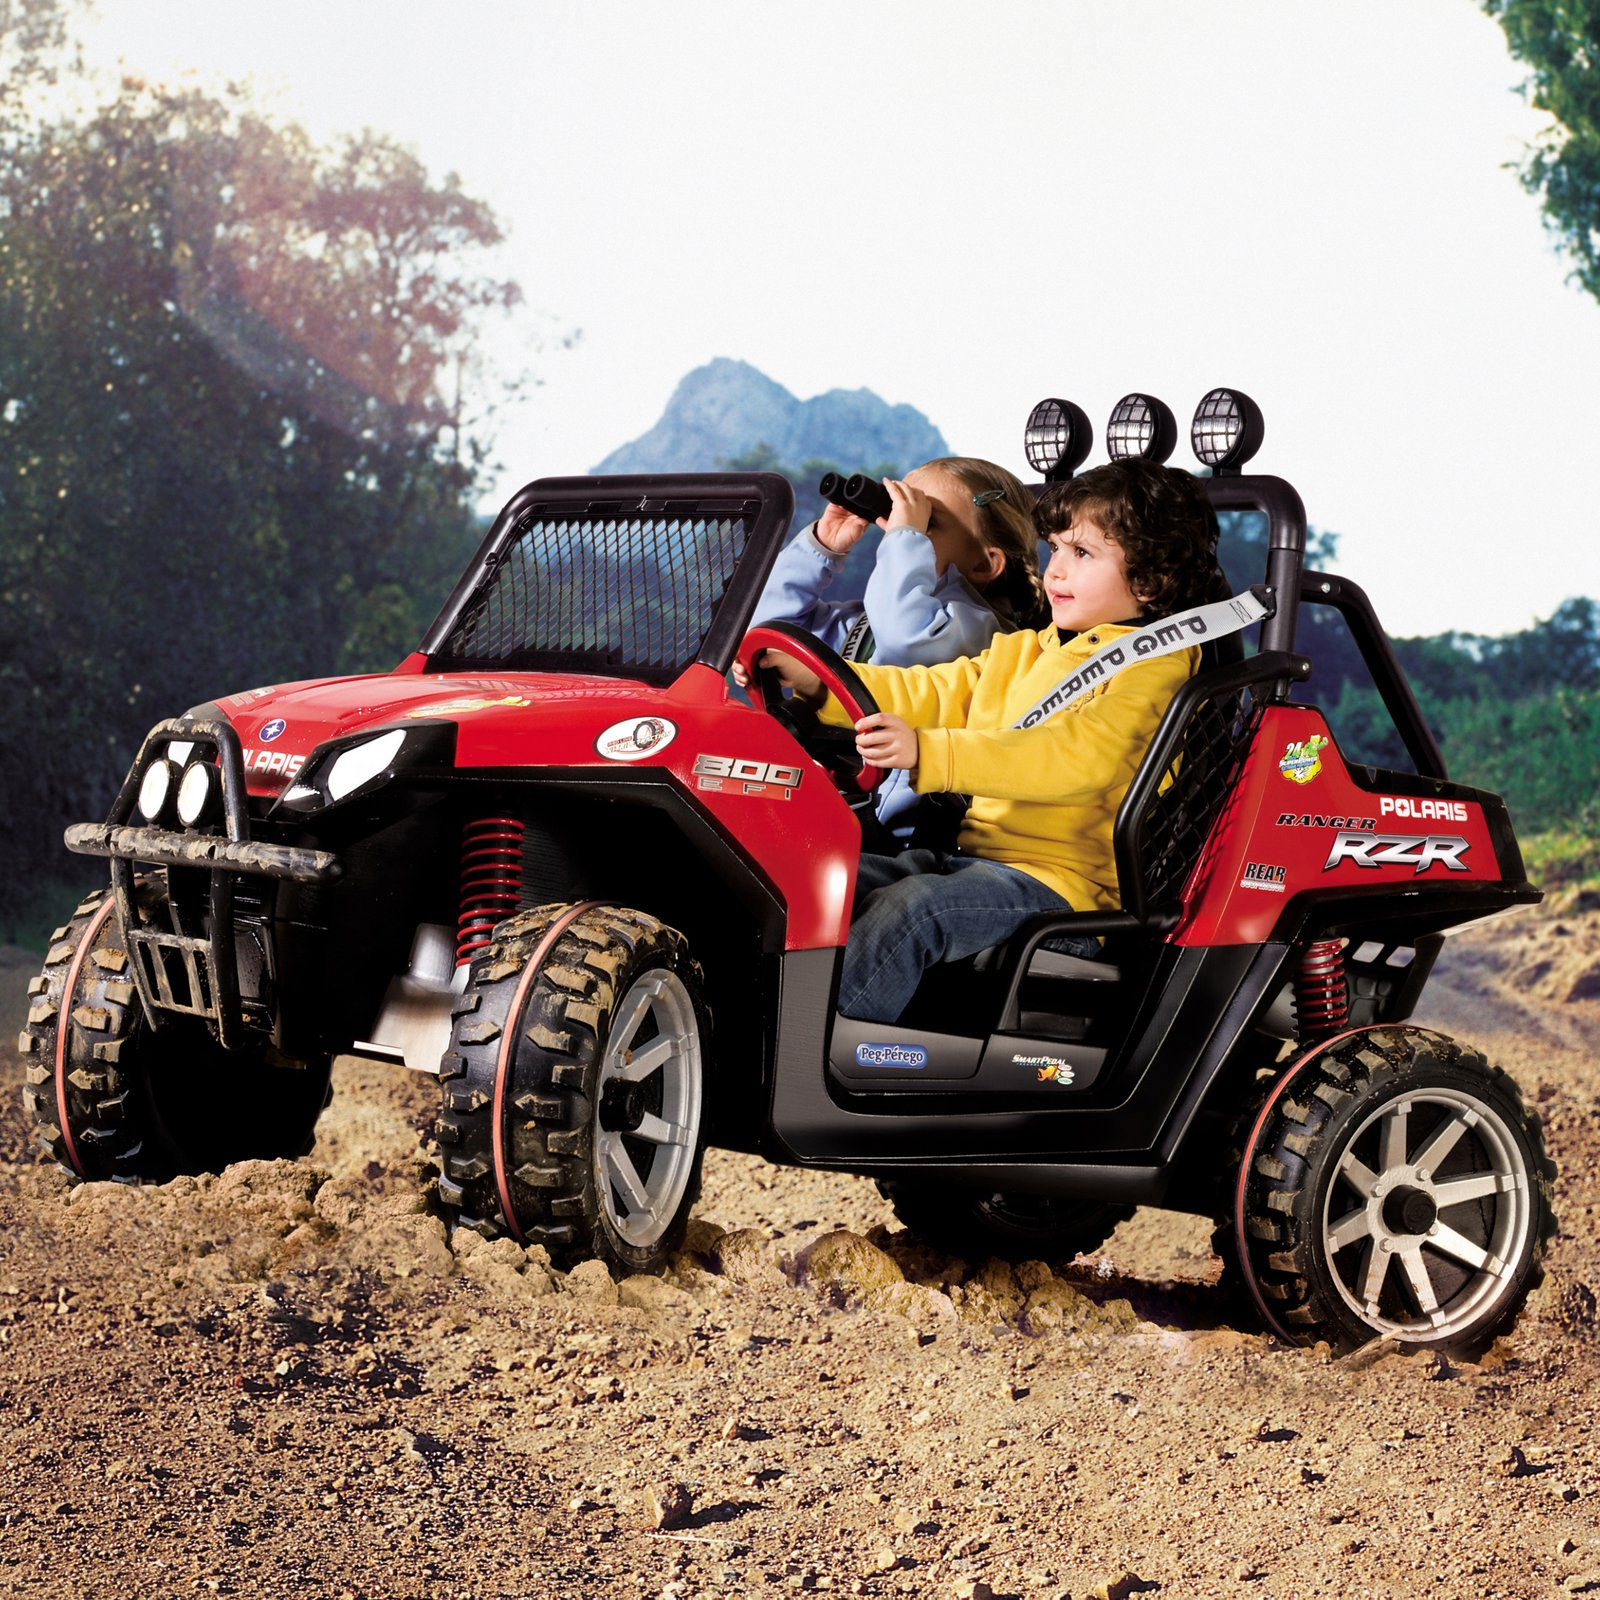 Peg Perego Polaris Ranger RZR ATV Battery Powered Riding Toy by Peg Perego USA Inc